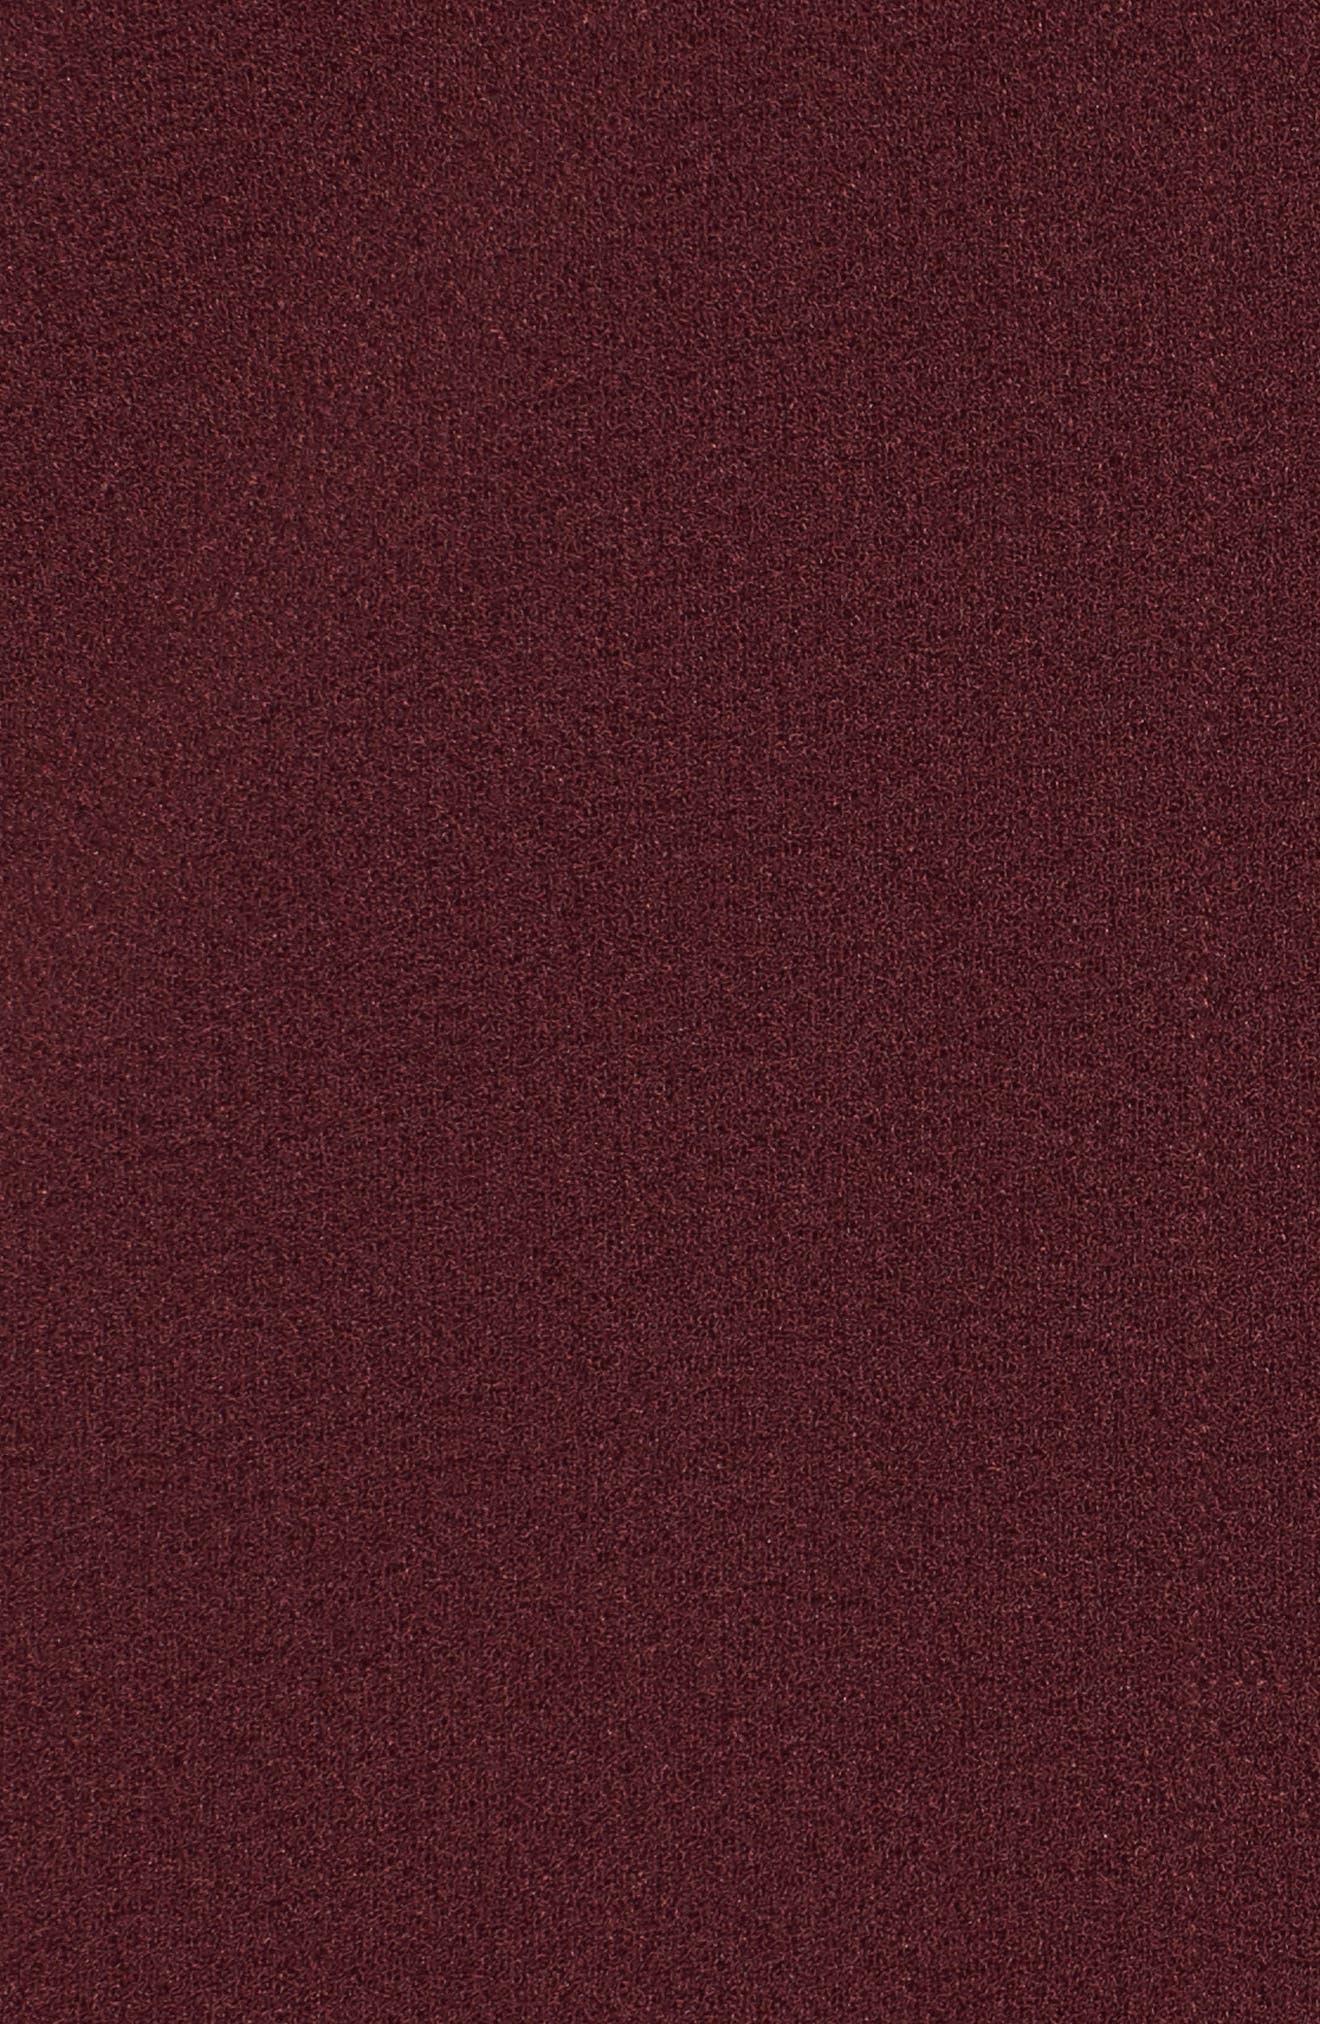 Hailey Crepe Dress,                             Alternate thumbnail 145, color,